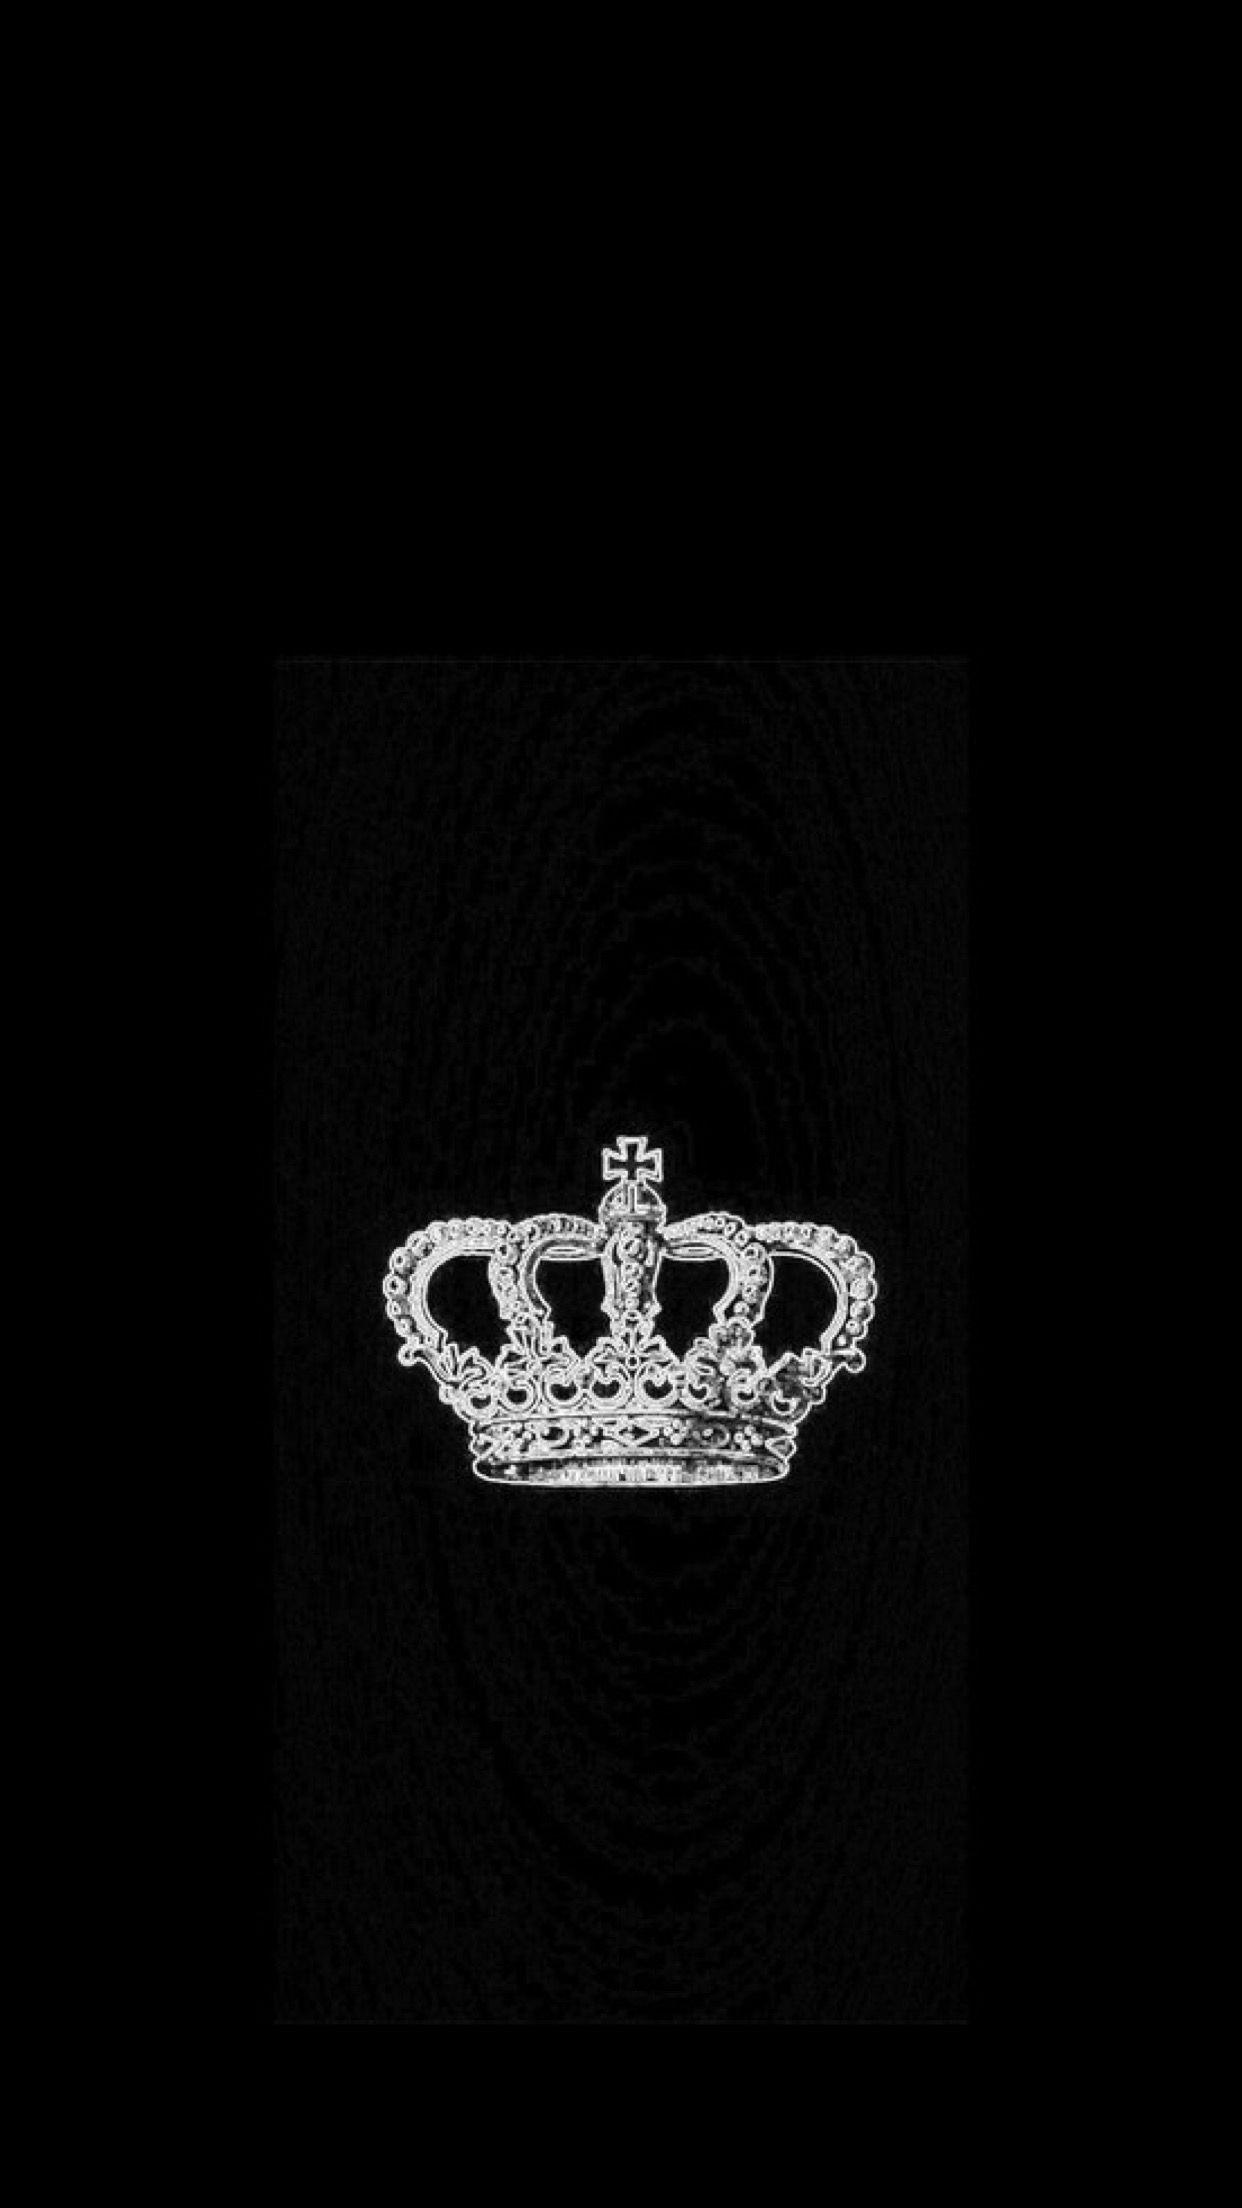 Pin By Alexa Krause On Artsy In 2019 Wallpaper Crown